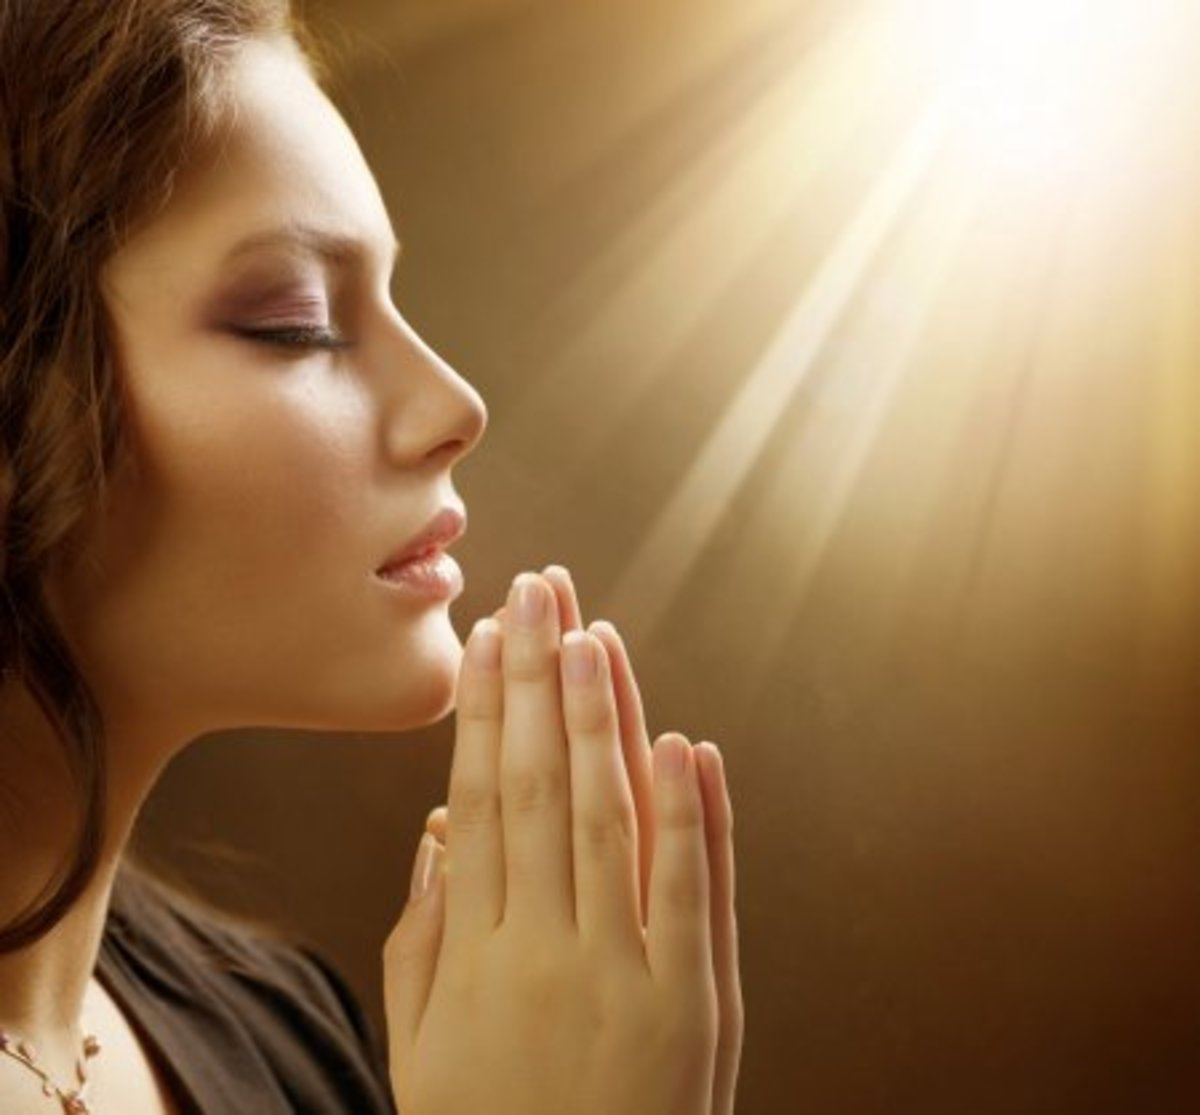 a-hymn-jesus-calls-us-to-prayer